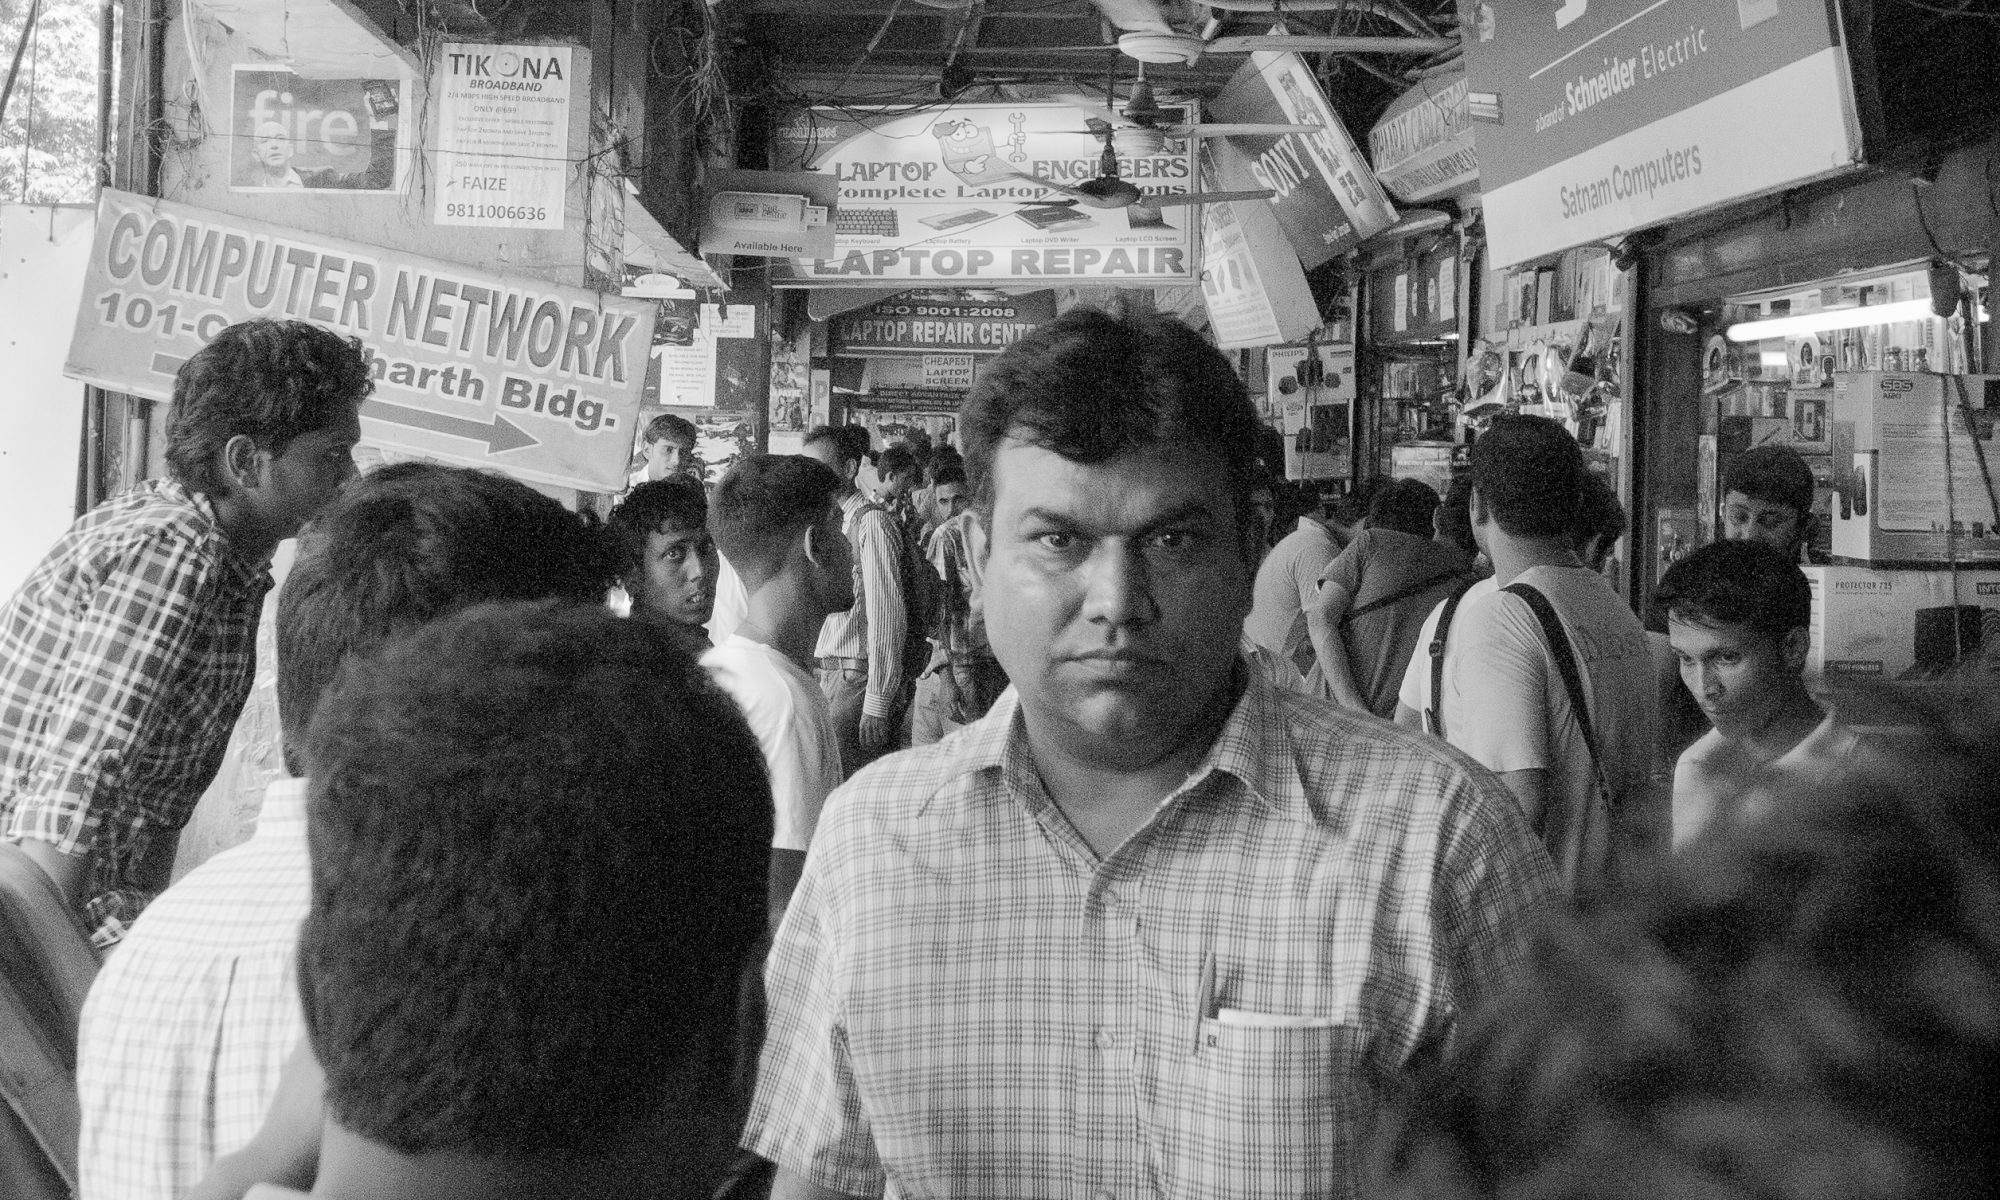 People I met in India